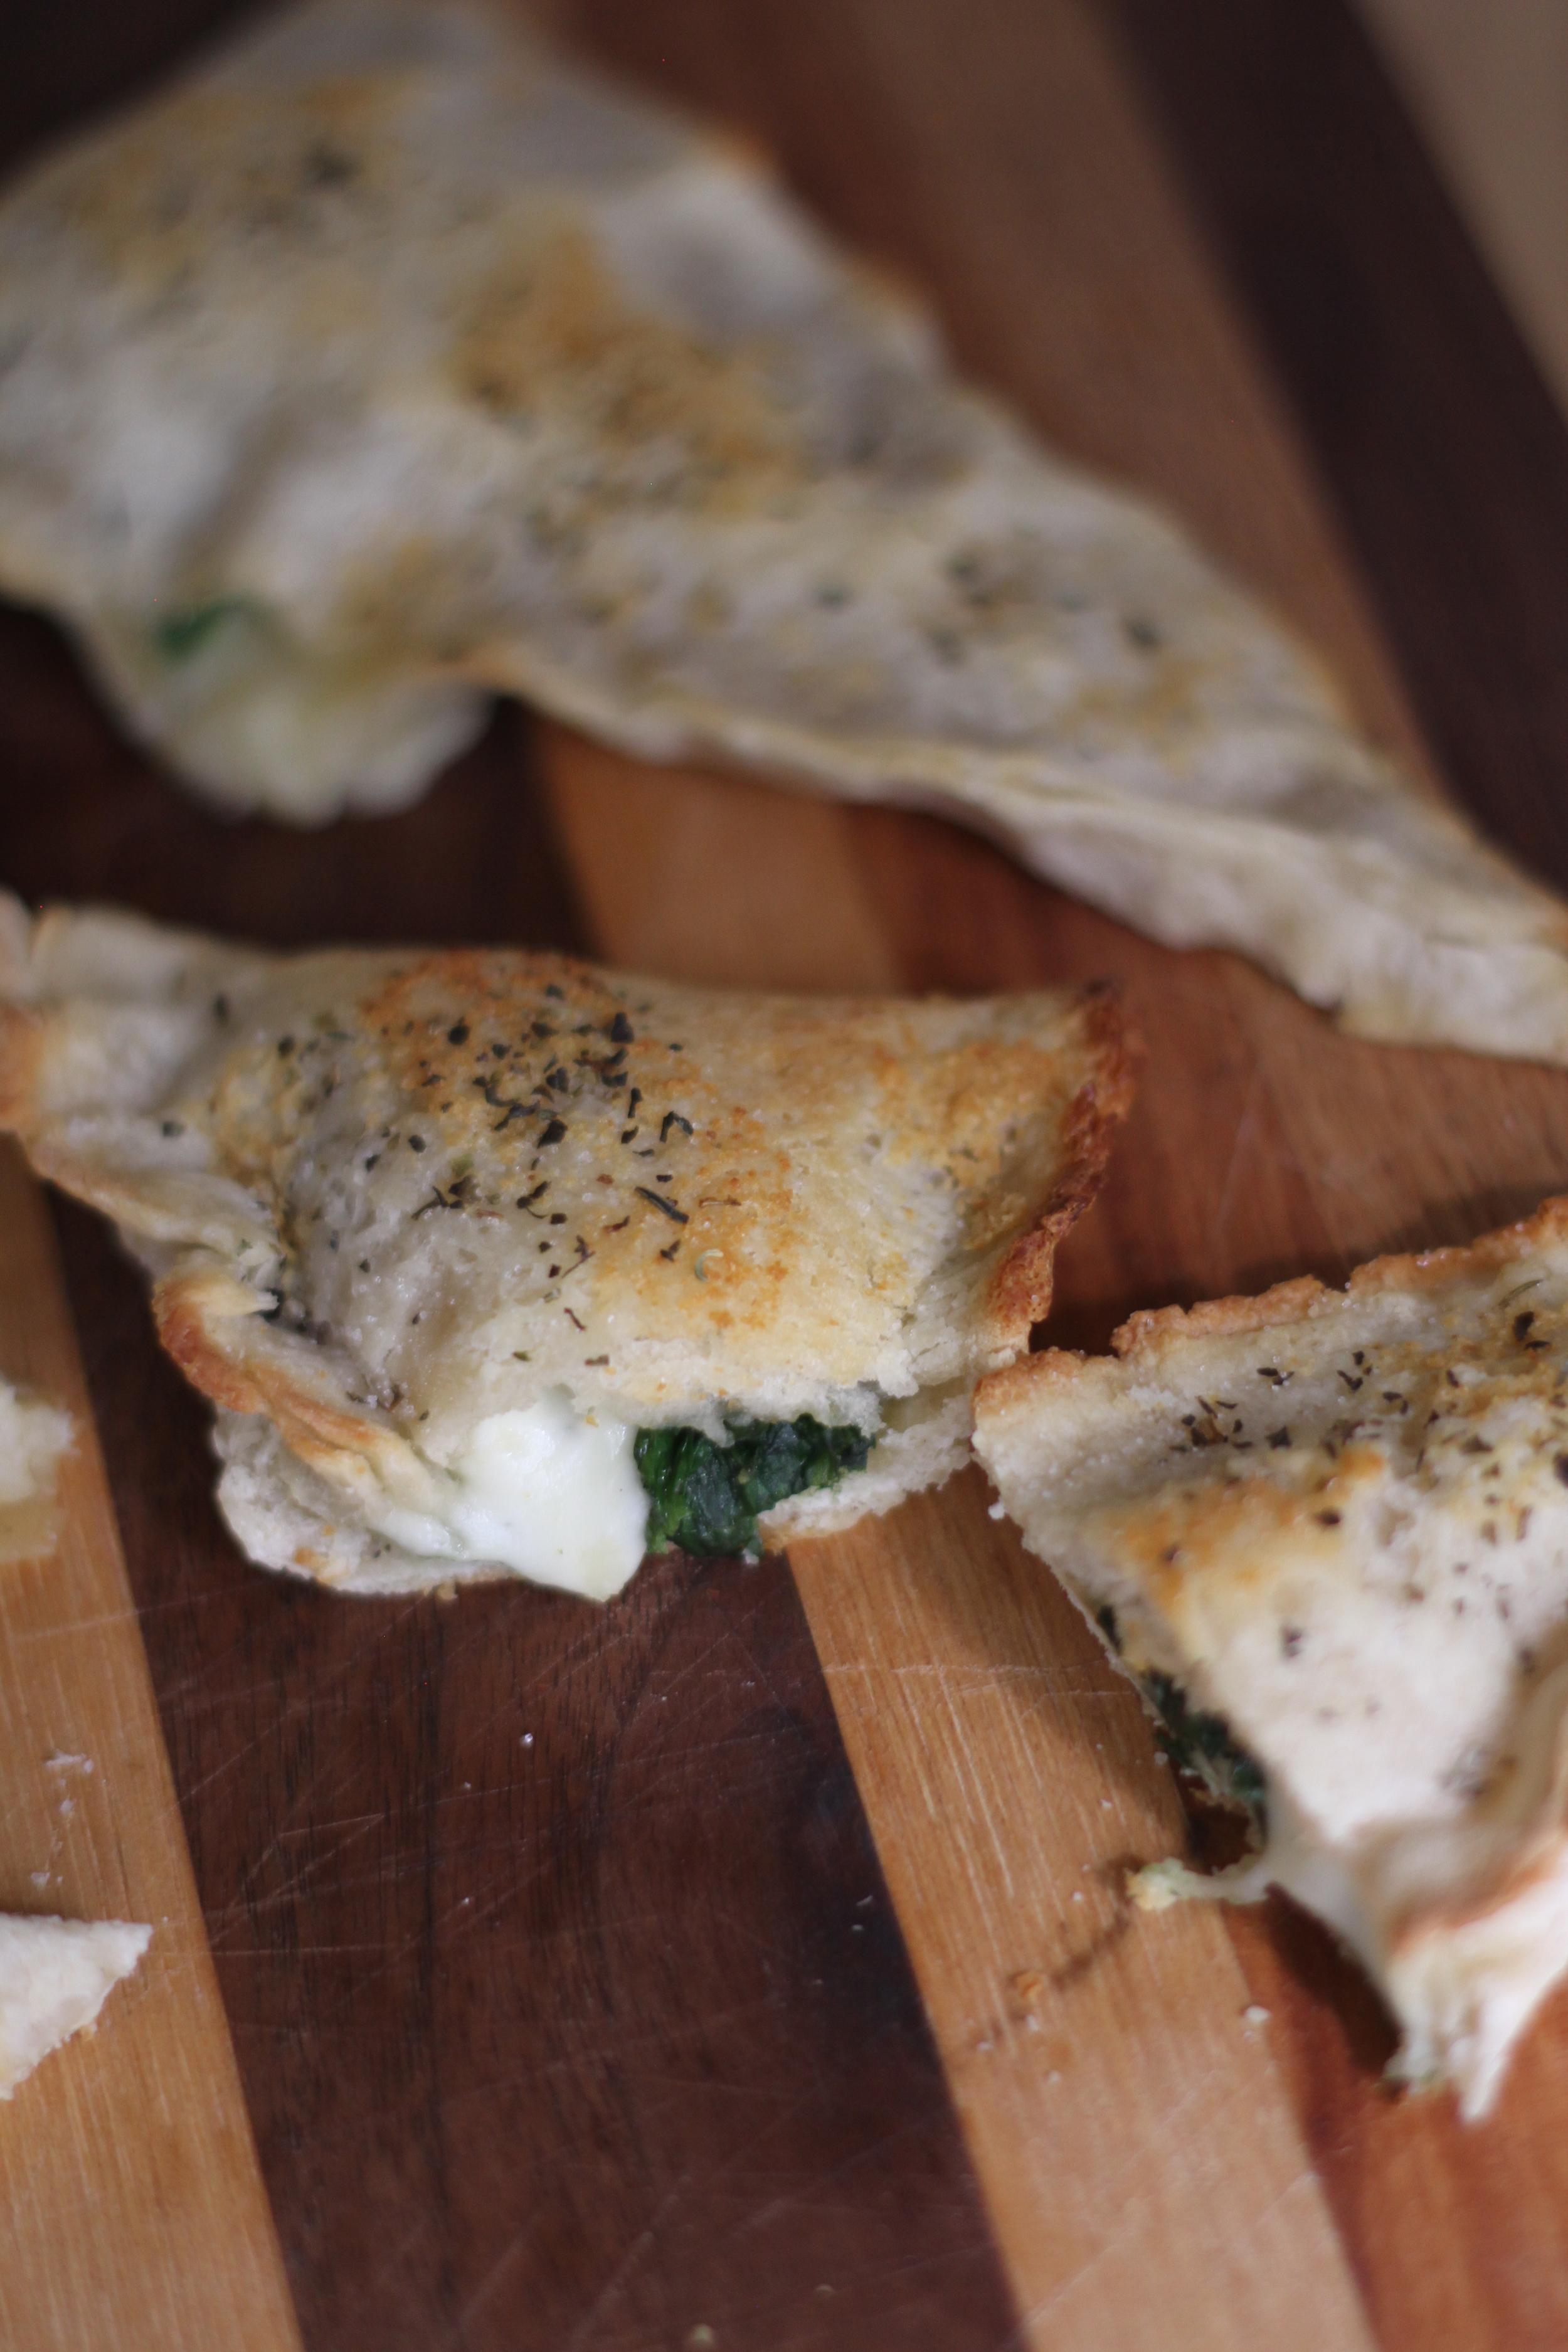 Garlic spinach and ooey gooey mozzarella! Delicious!